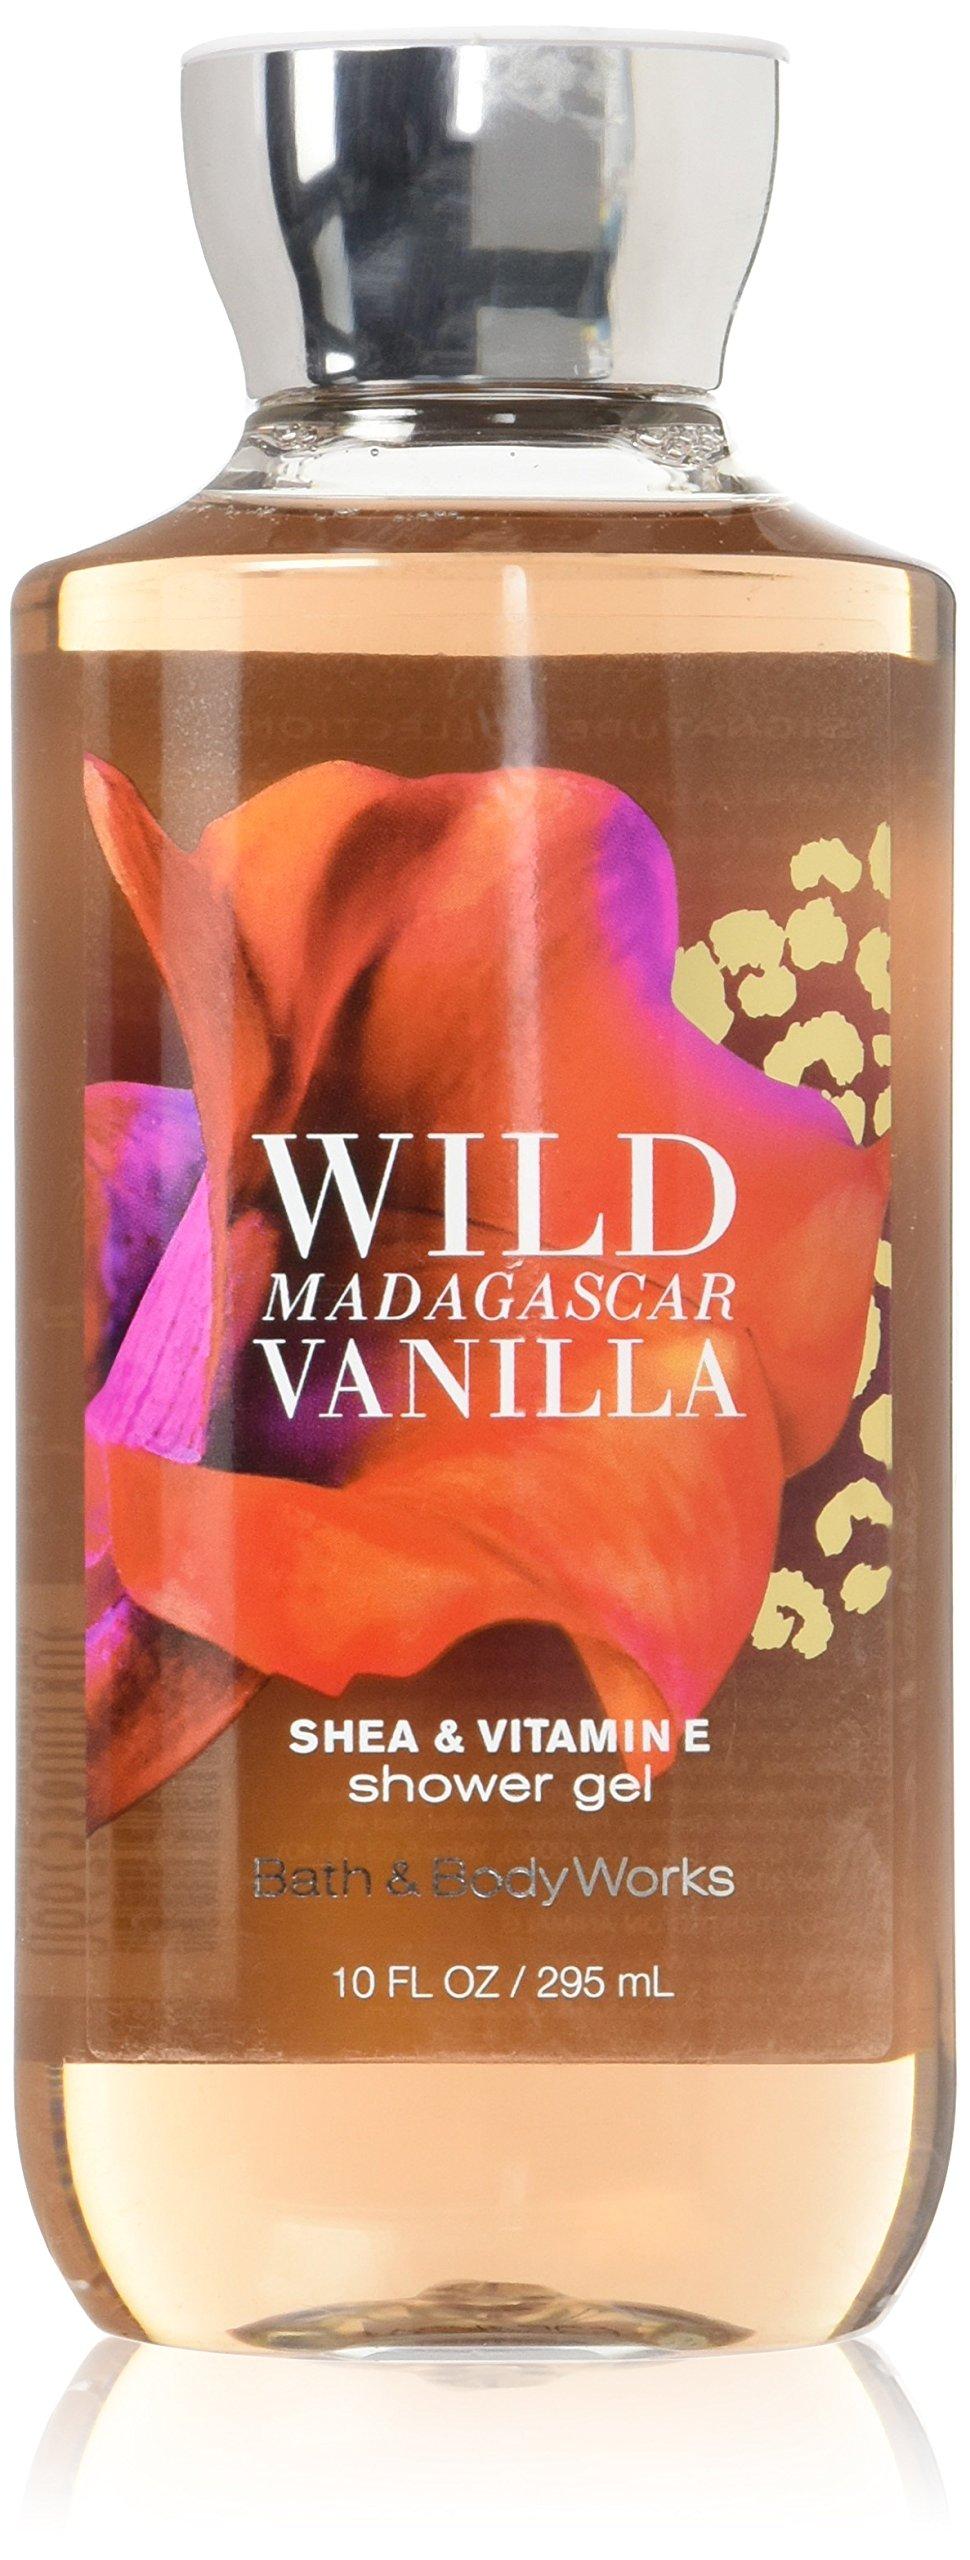 WILD MADAGASCAR VANILLA Shower Gel 10 fl oz / 295 mL